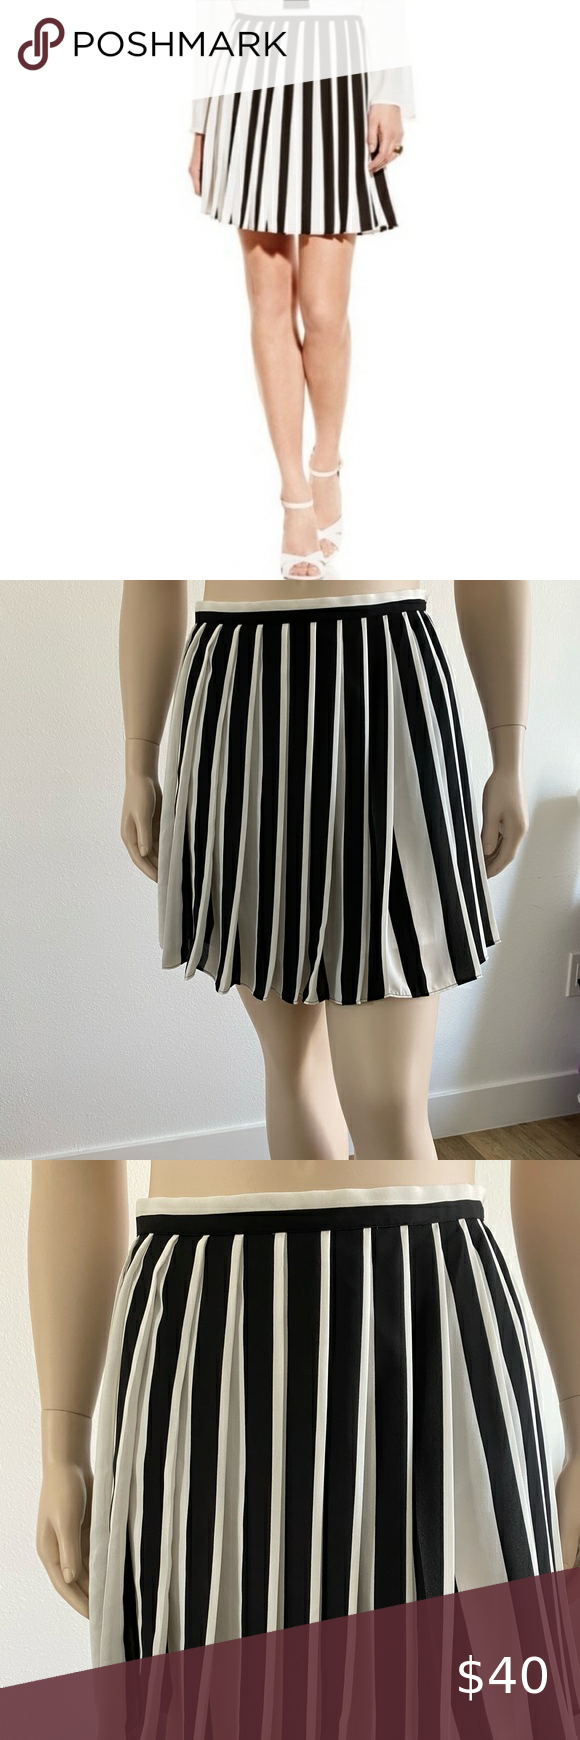 Vince Camuto Women's Pleated Skirt White/Black